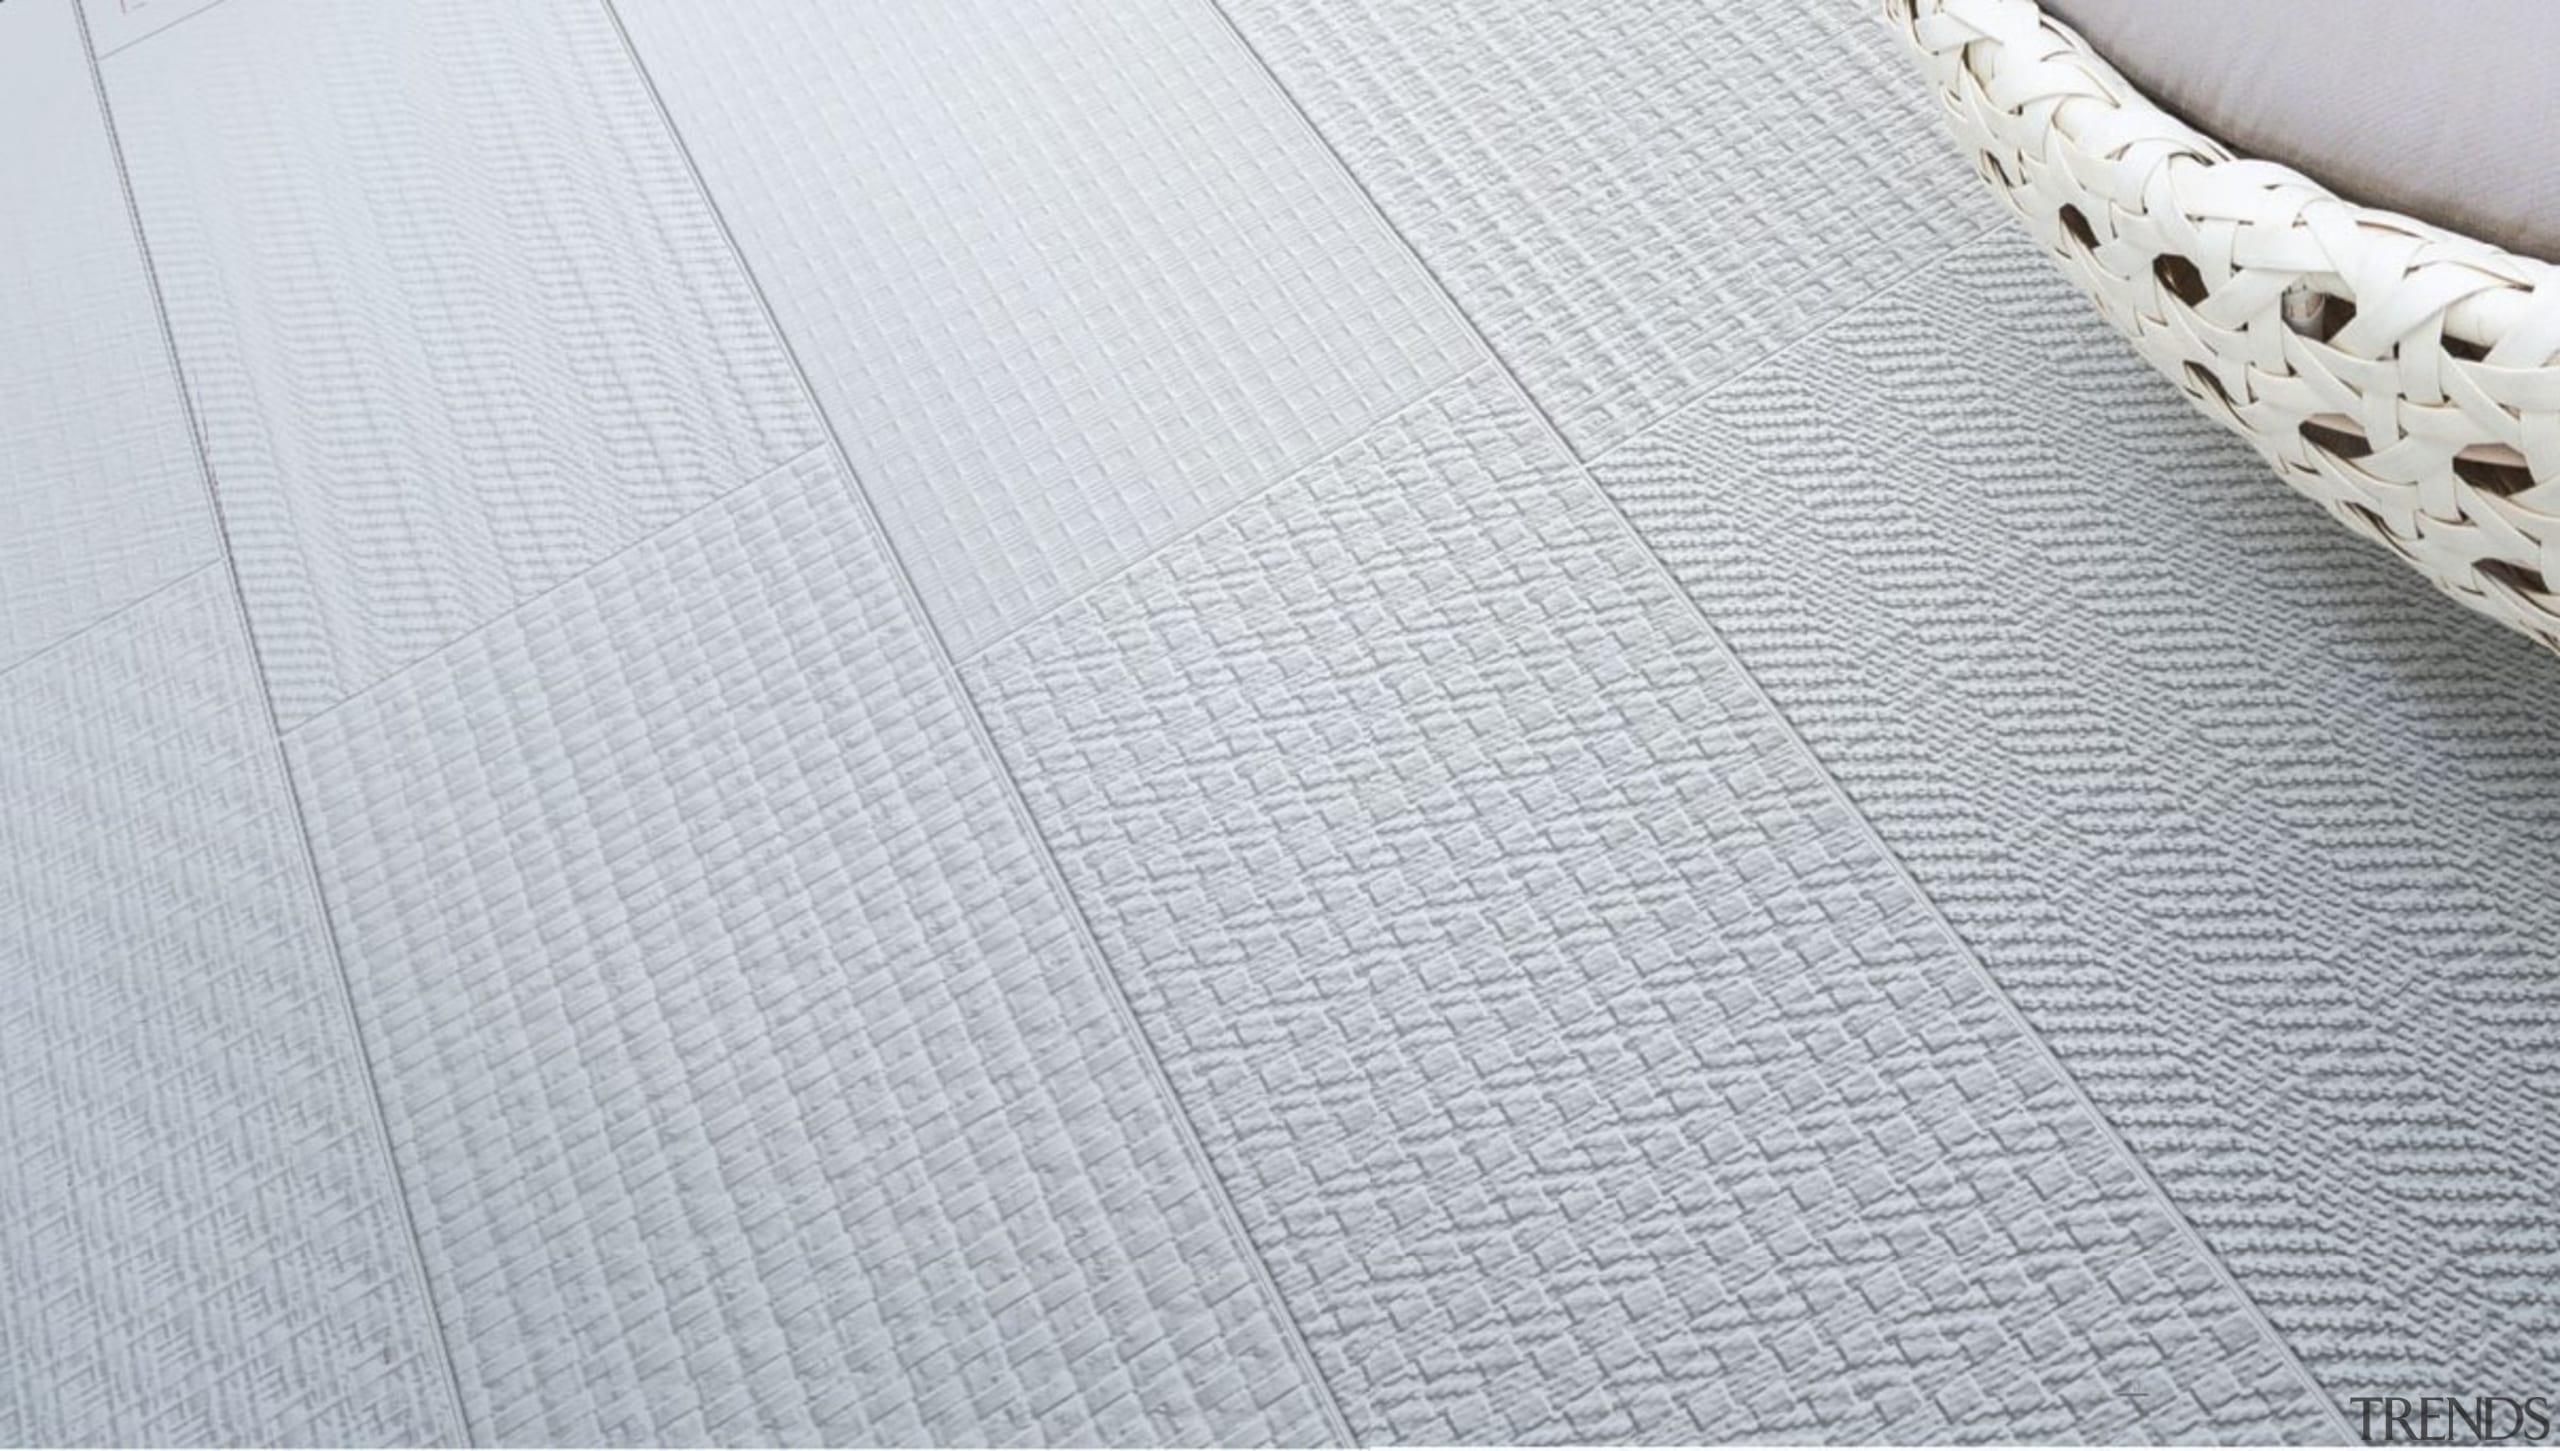 Twelve different textures, randomly mixed. - Brick Text floor, line, gray